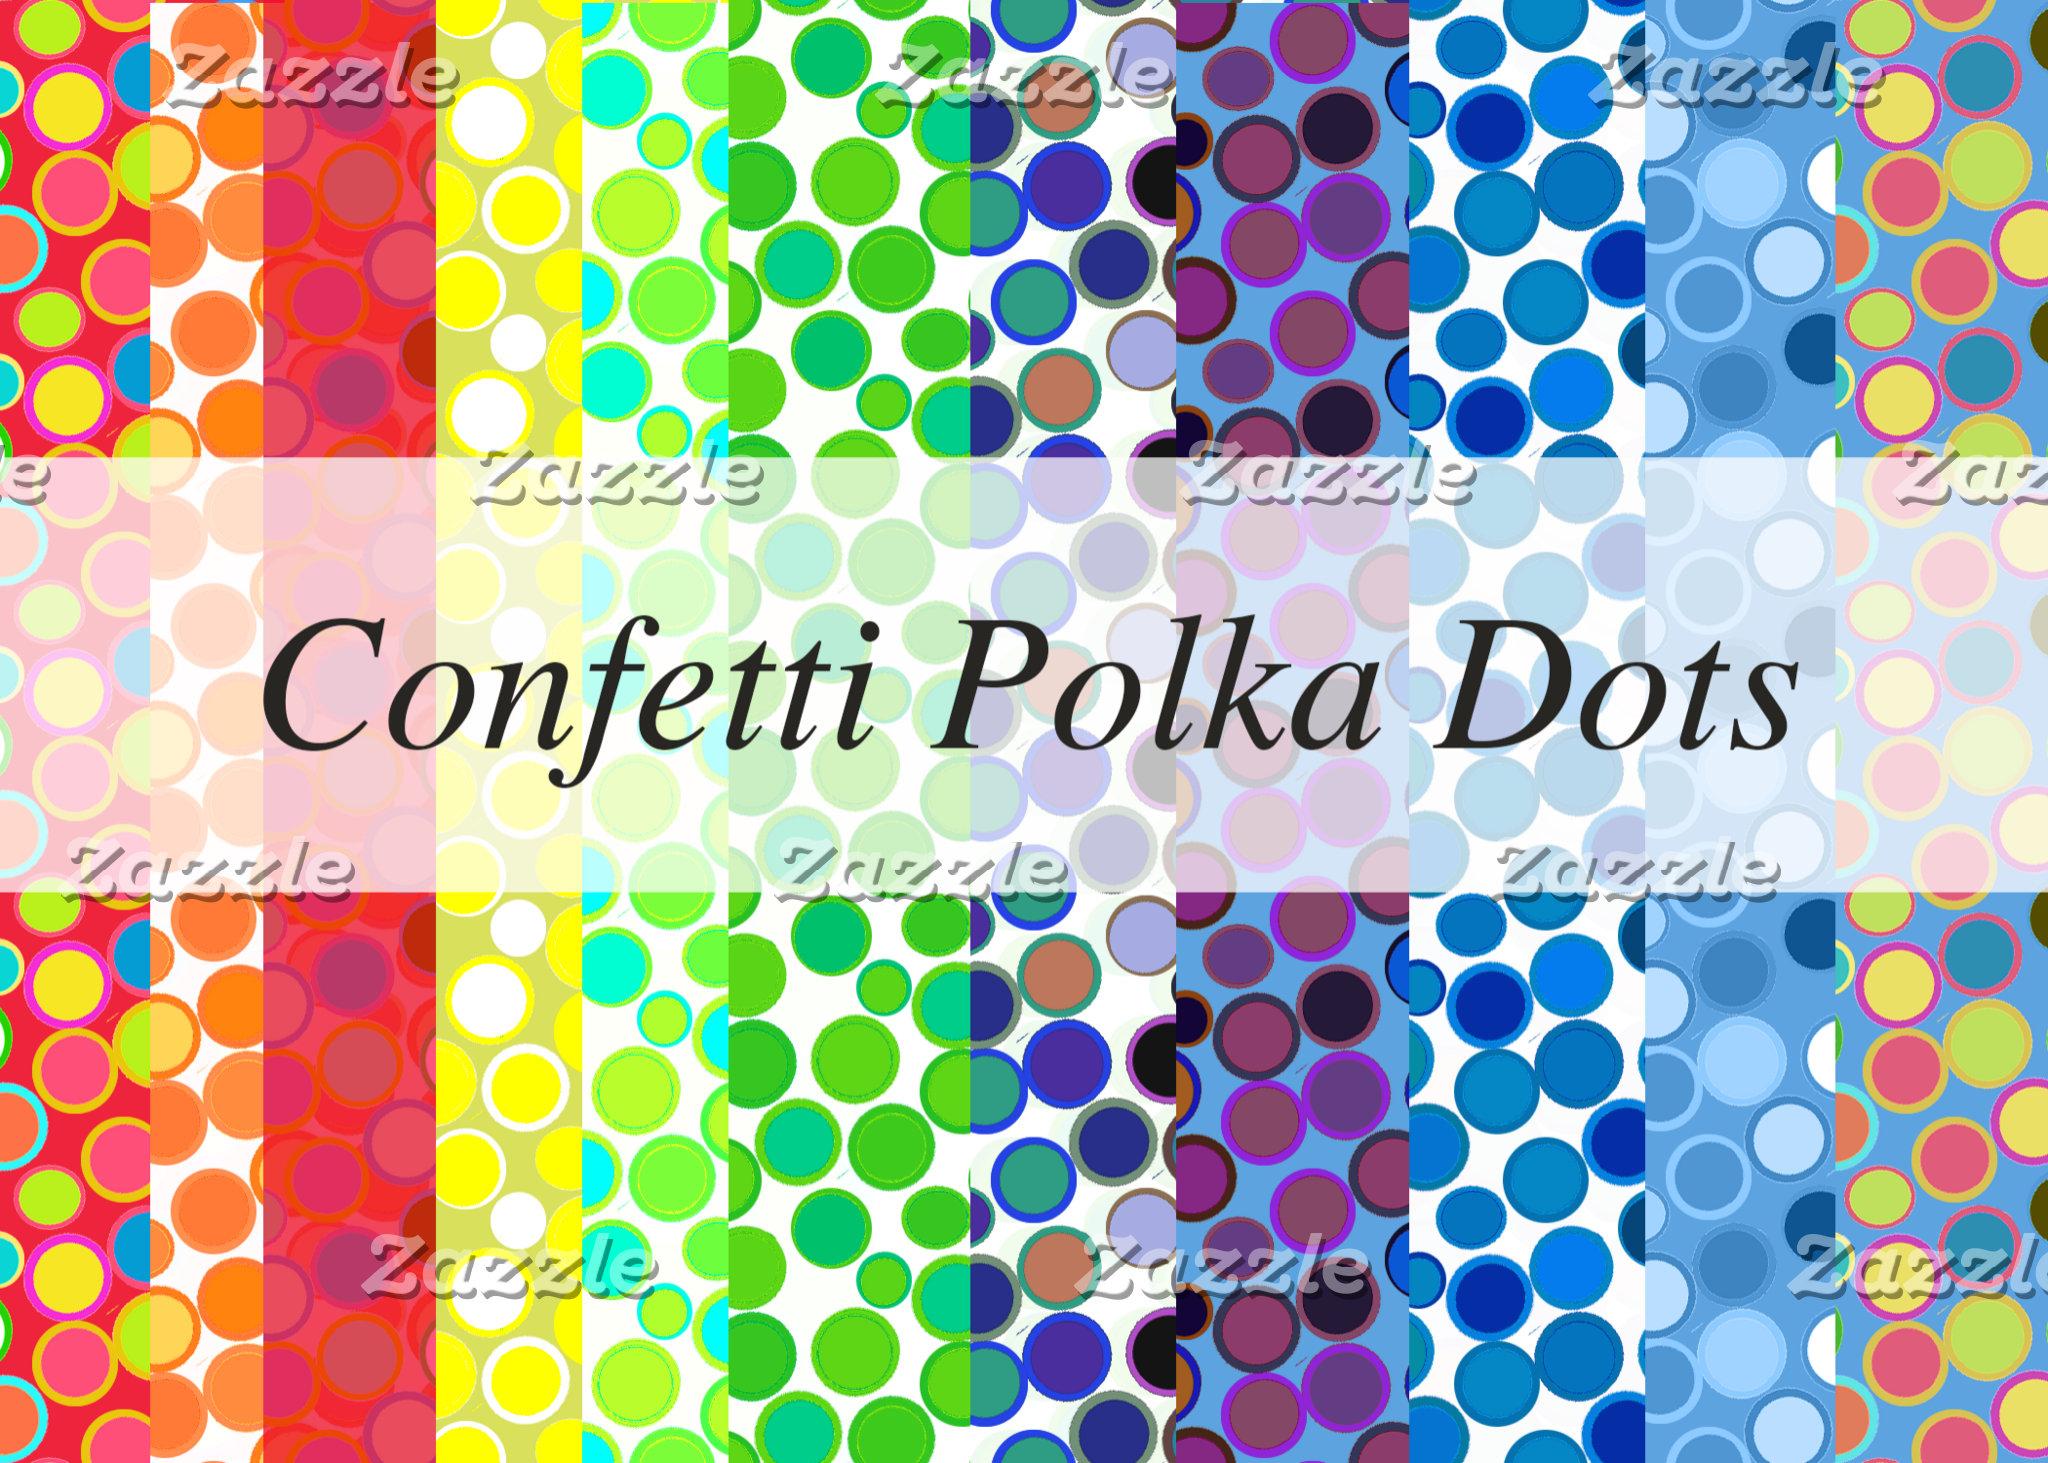 Confetti Polka Dots